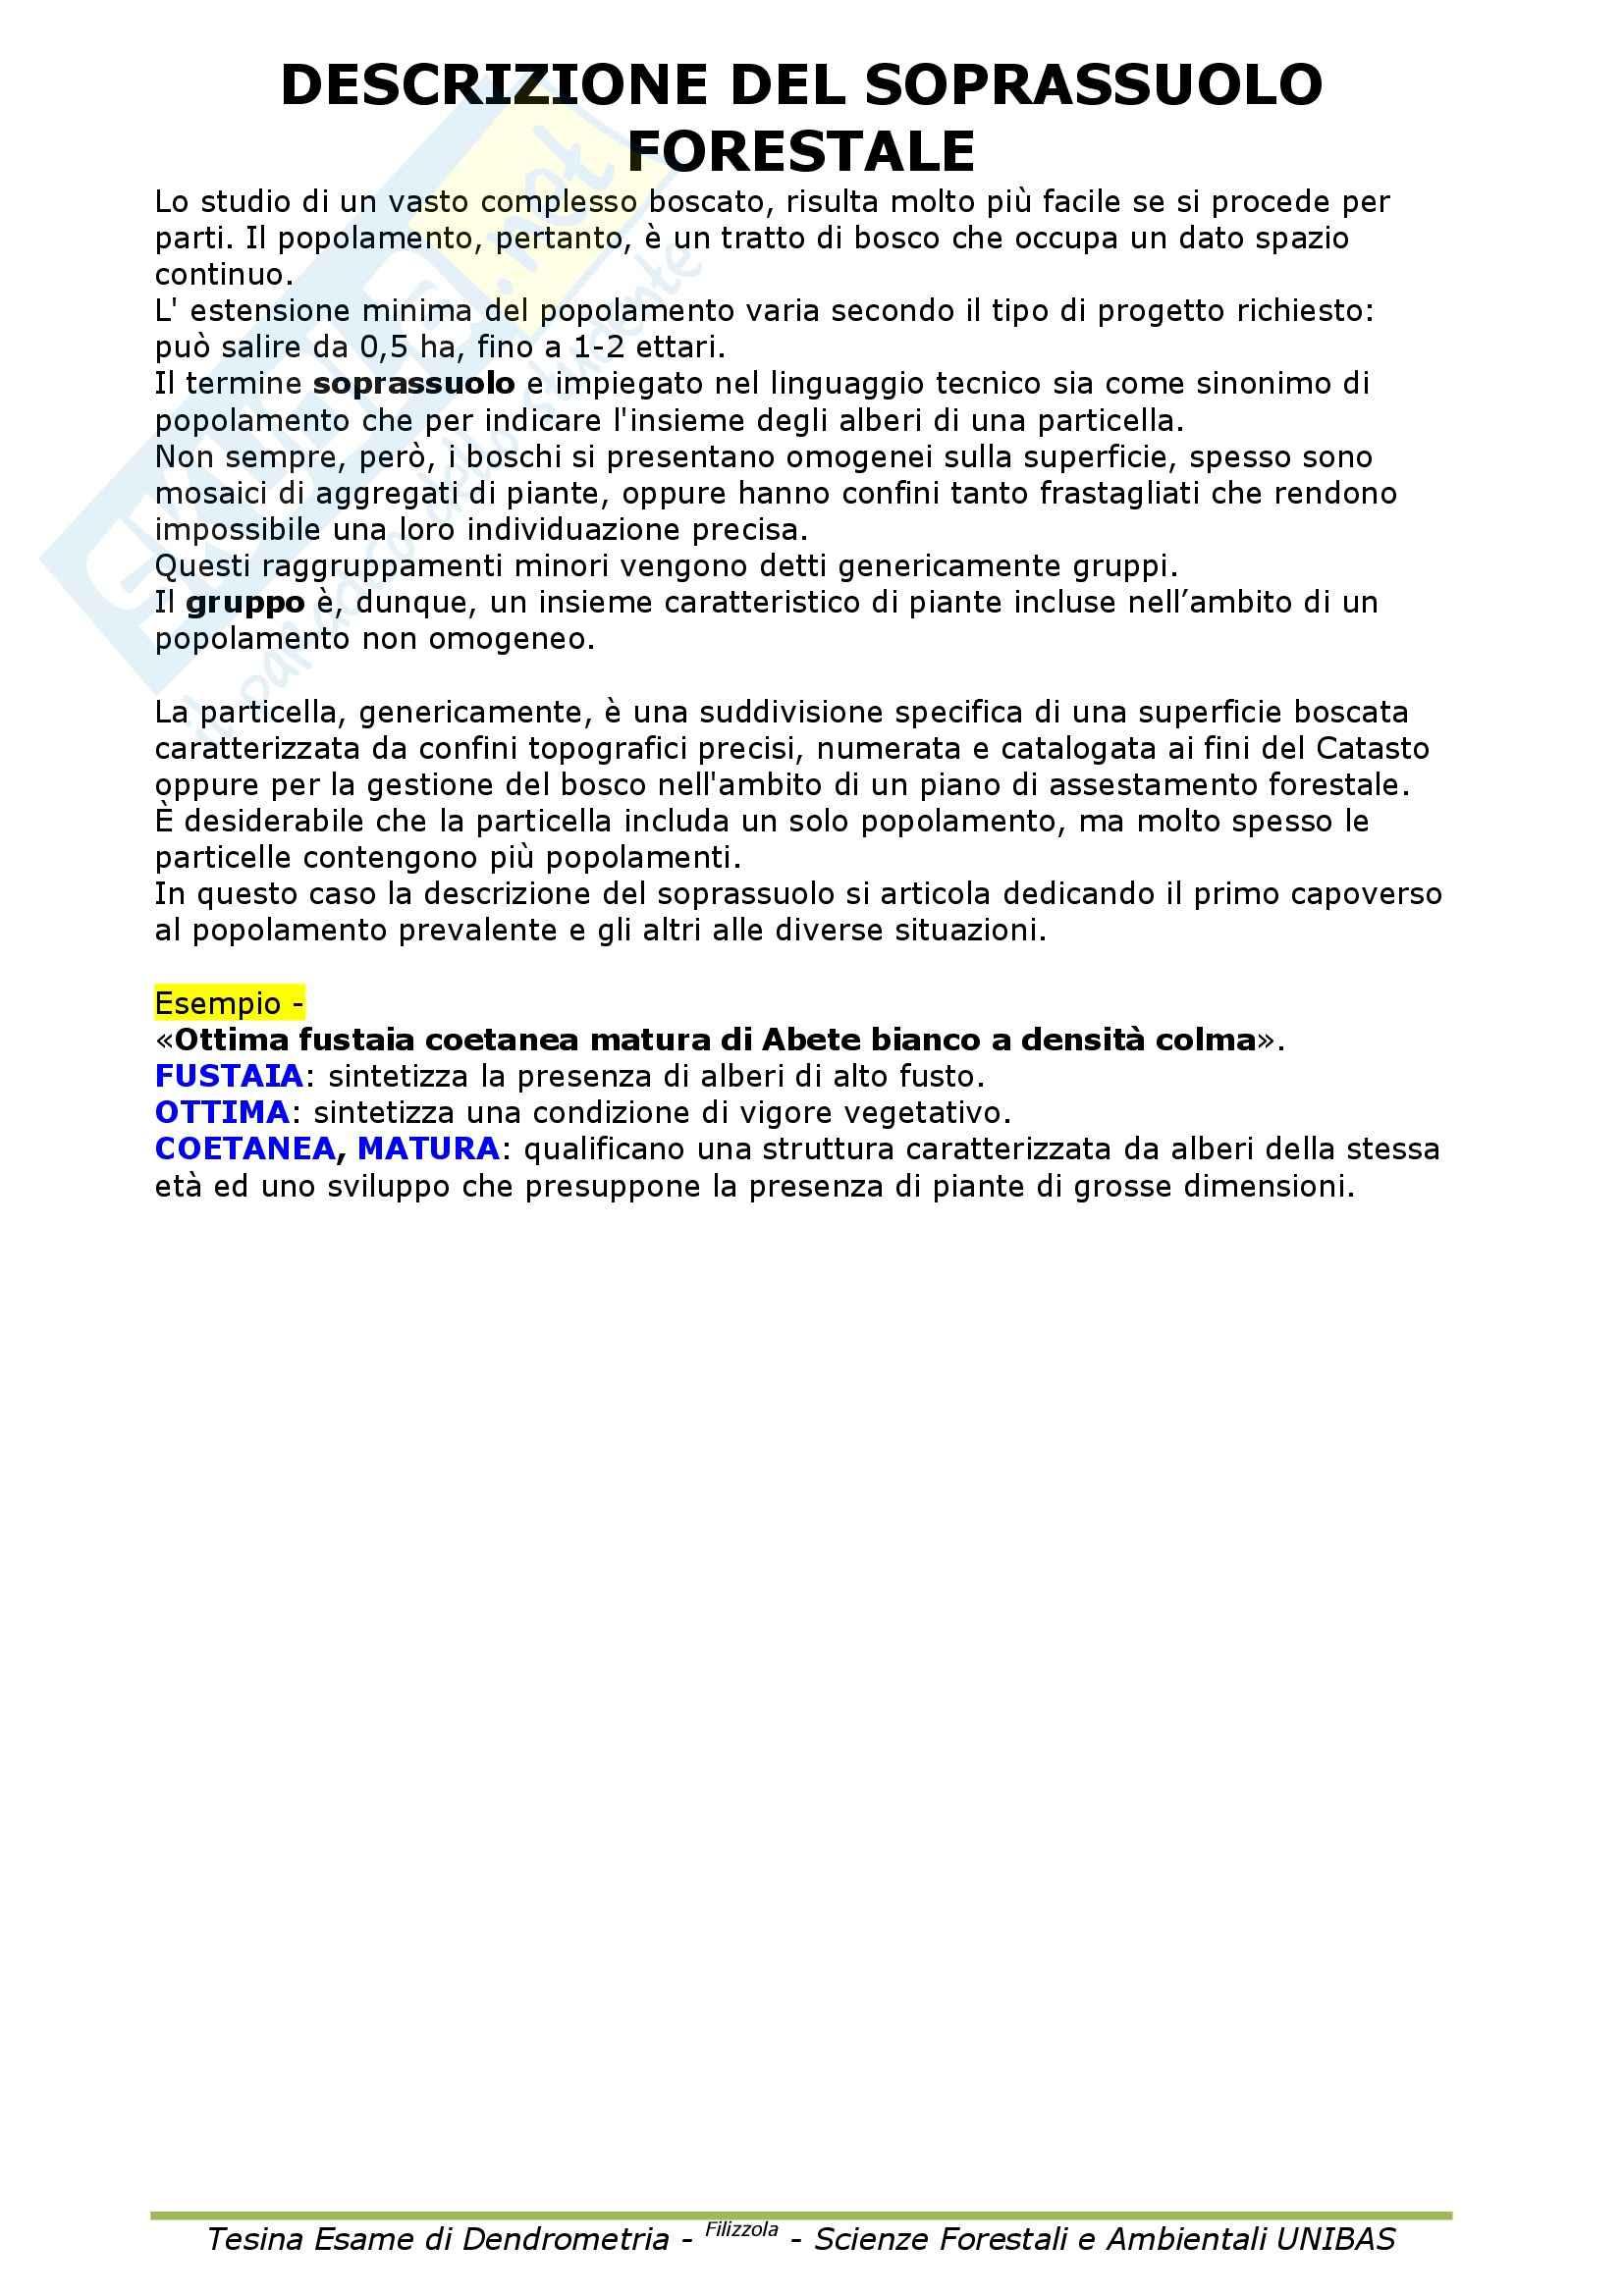 Dendrometria - Appunti Pag. 36